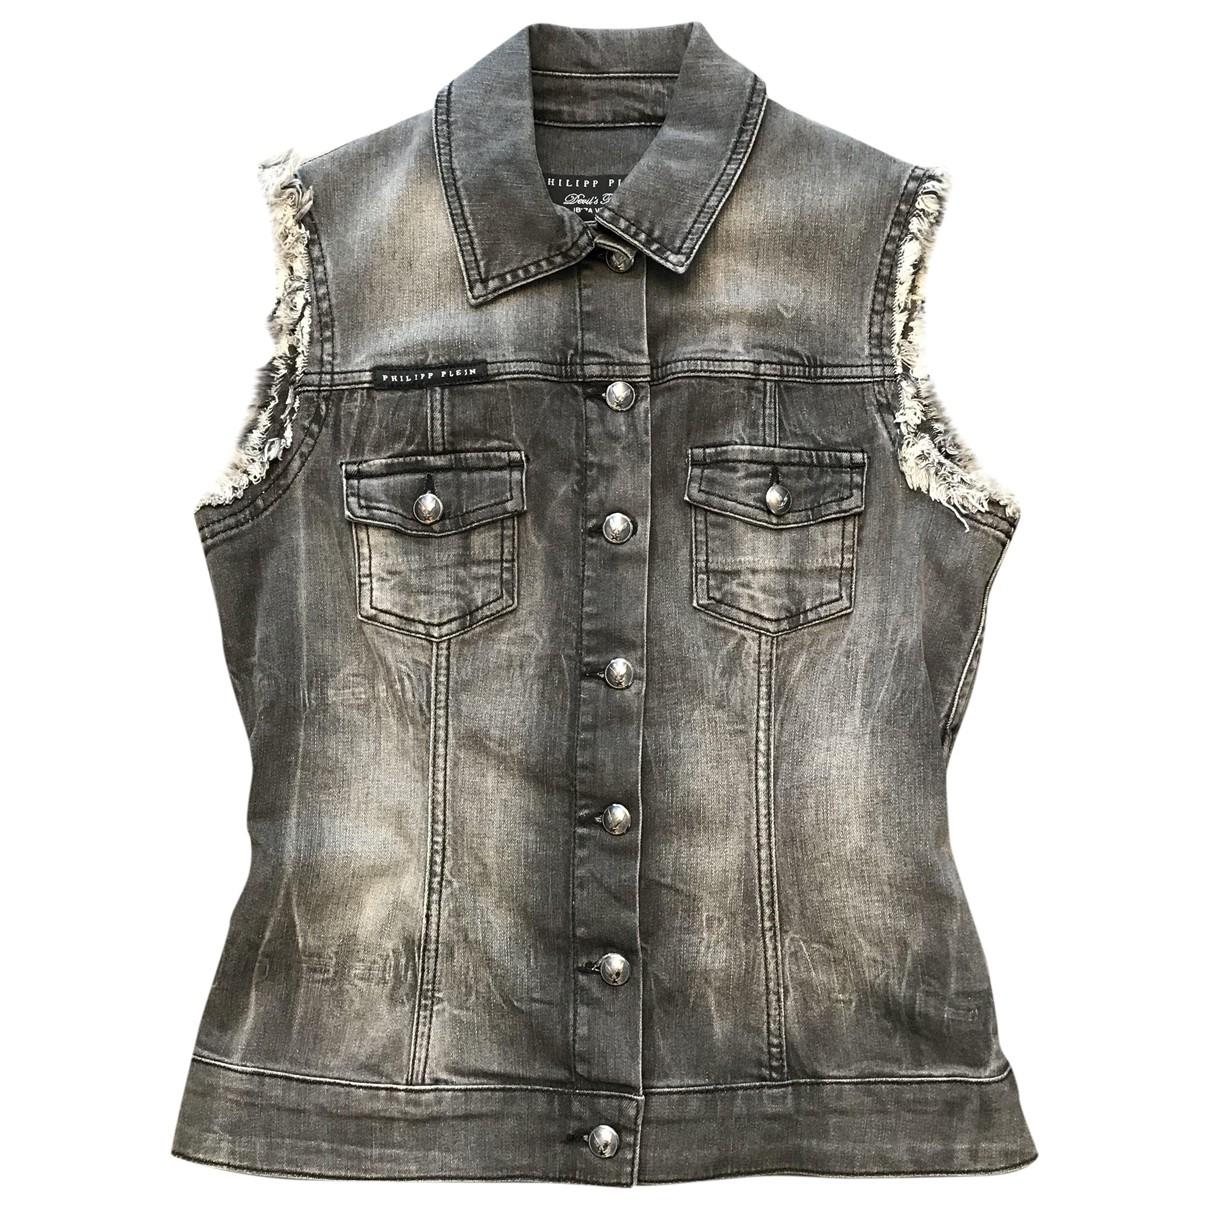 Philipp Plein \N Grey Cotton jacket for Women S International